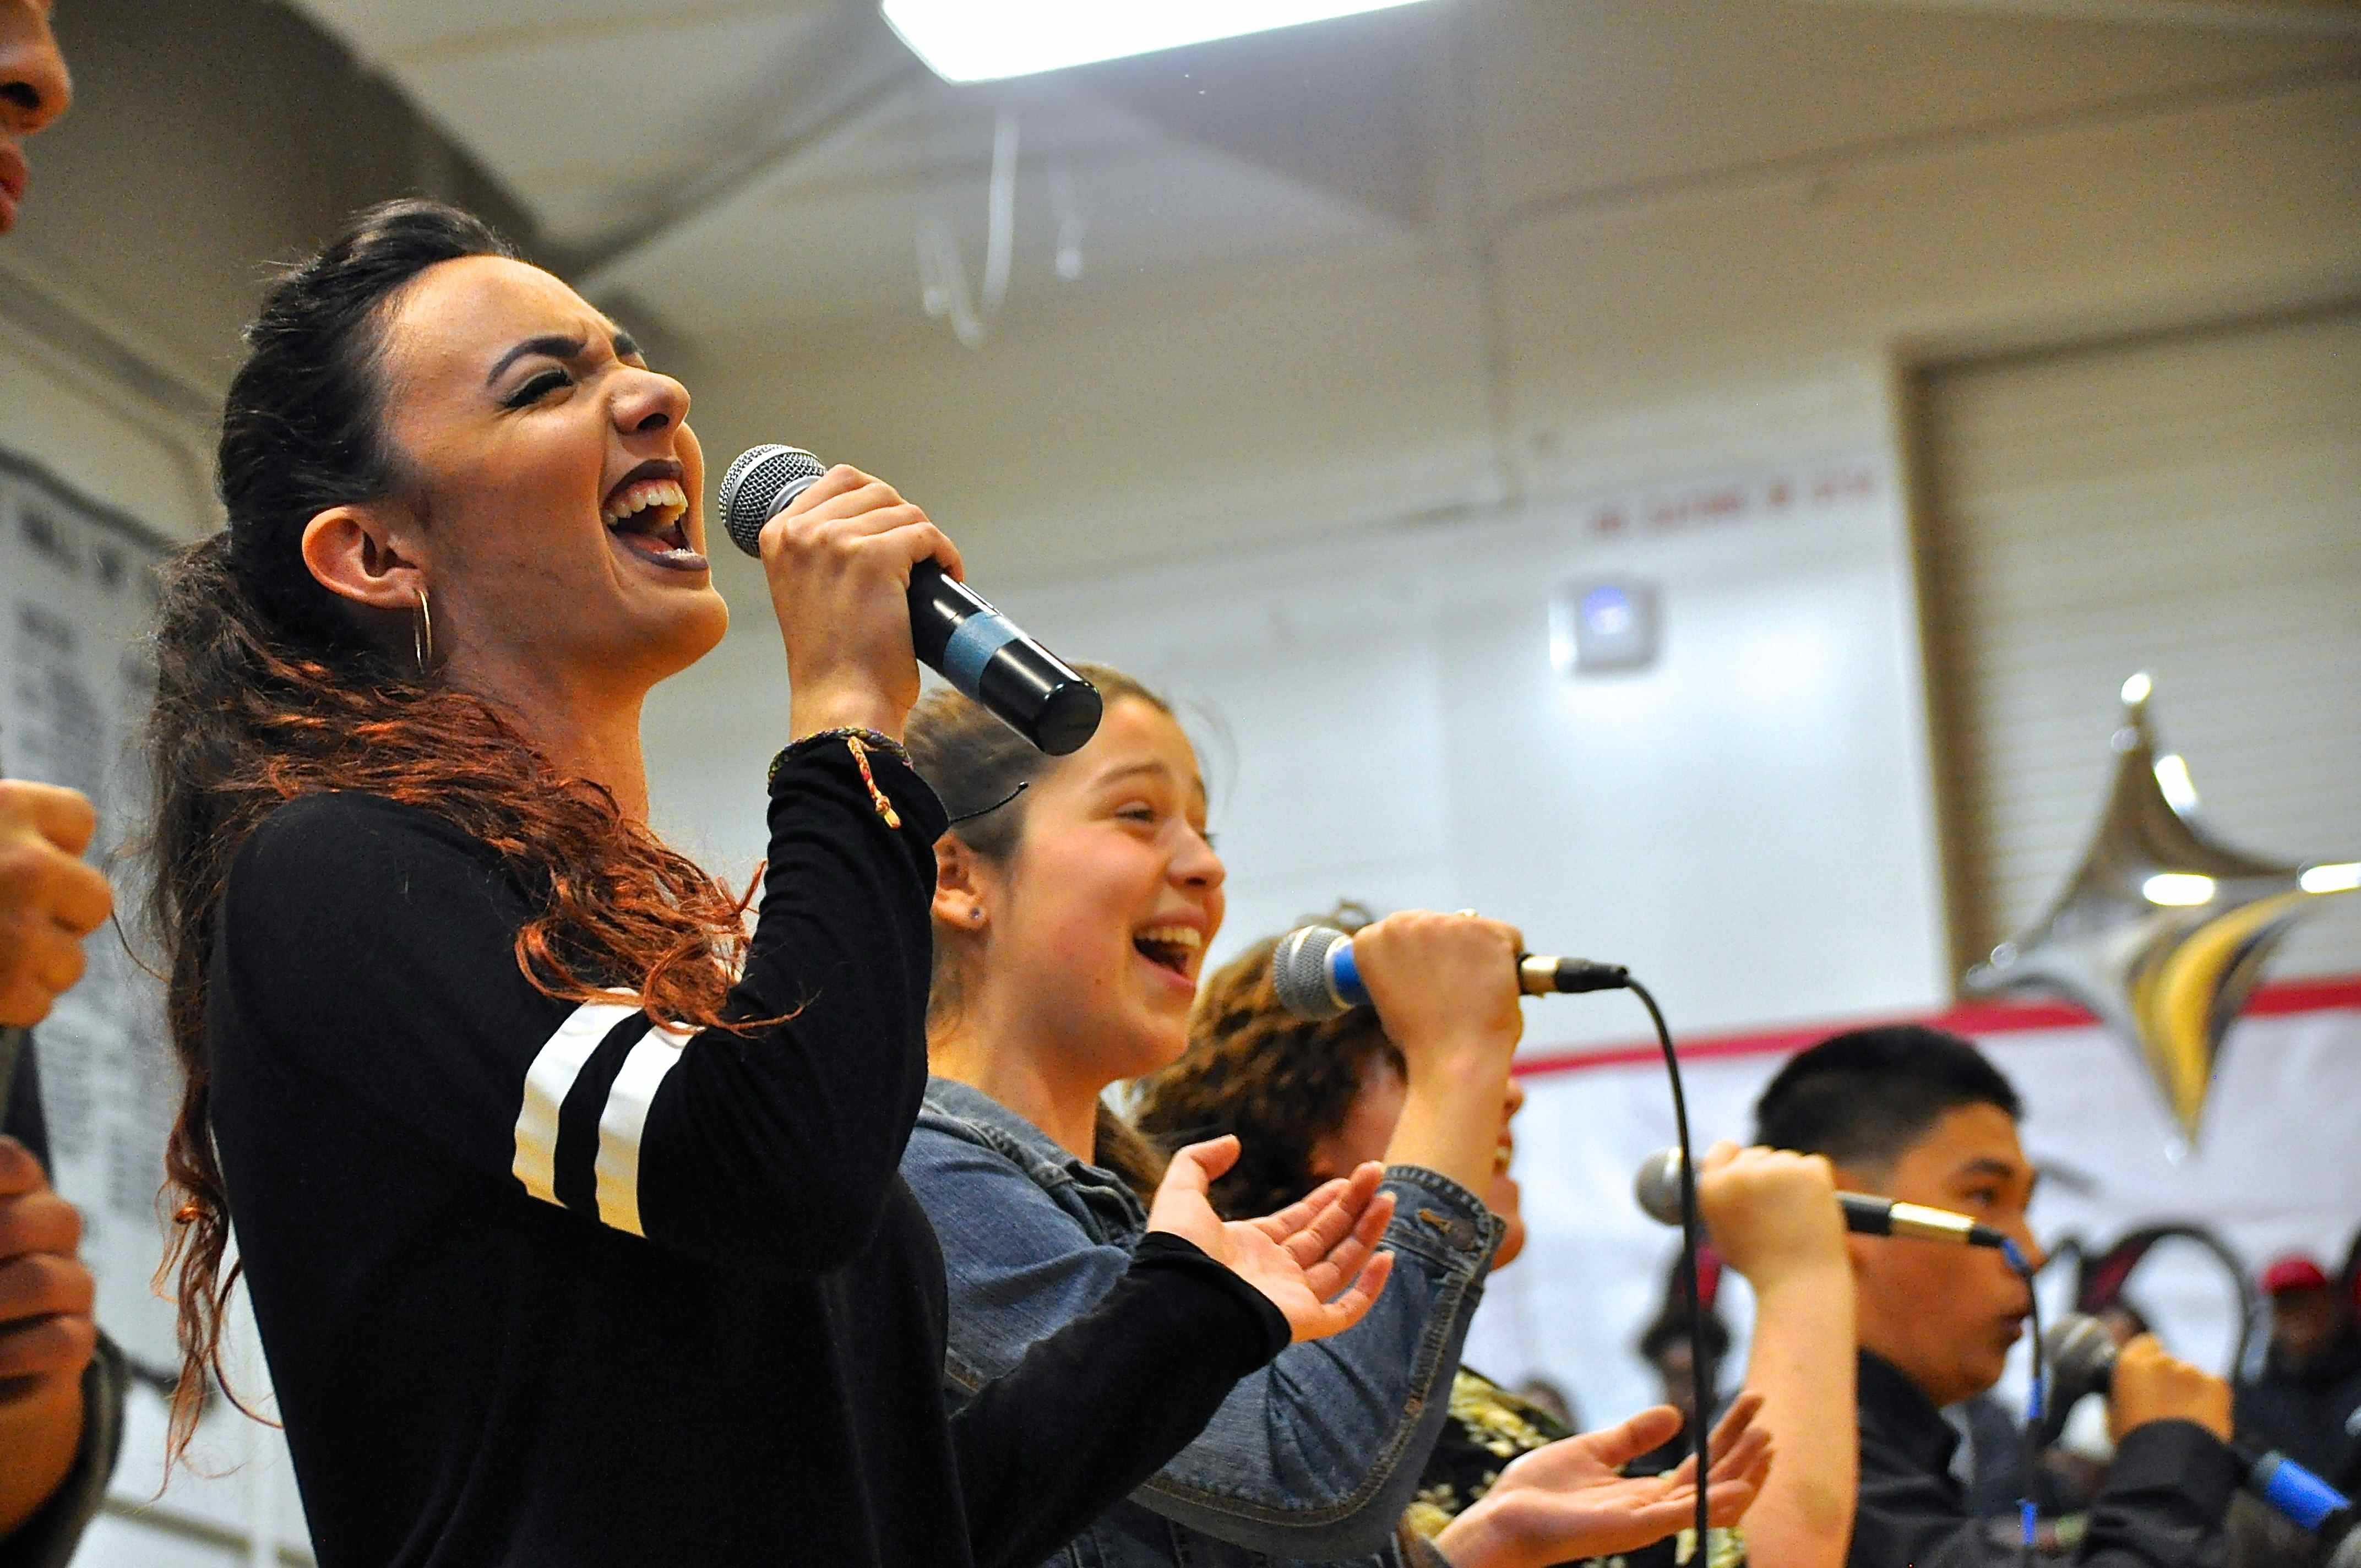 Senior+Sierra+Segal+belts+high+note+during+the+choir+performance.